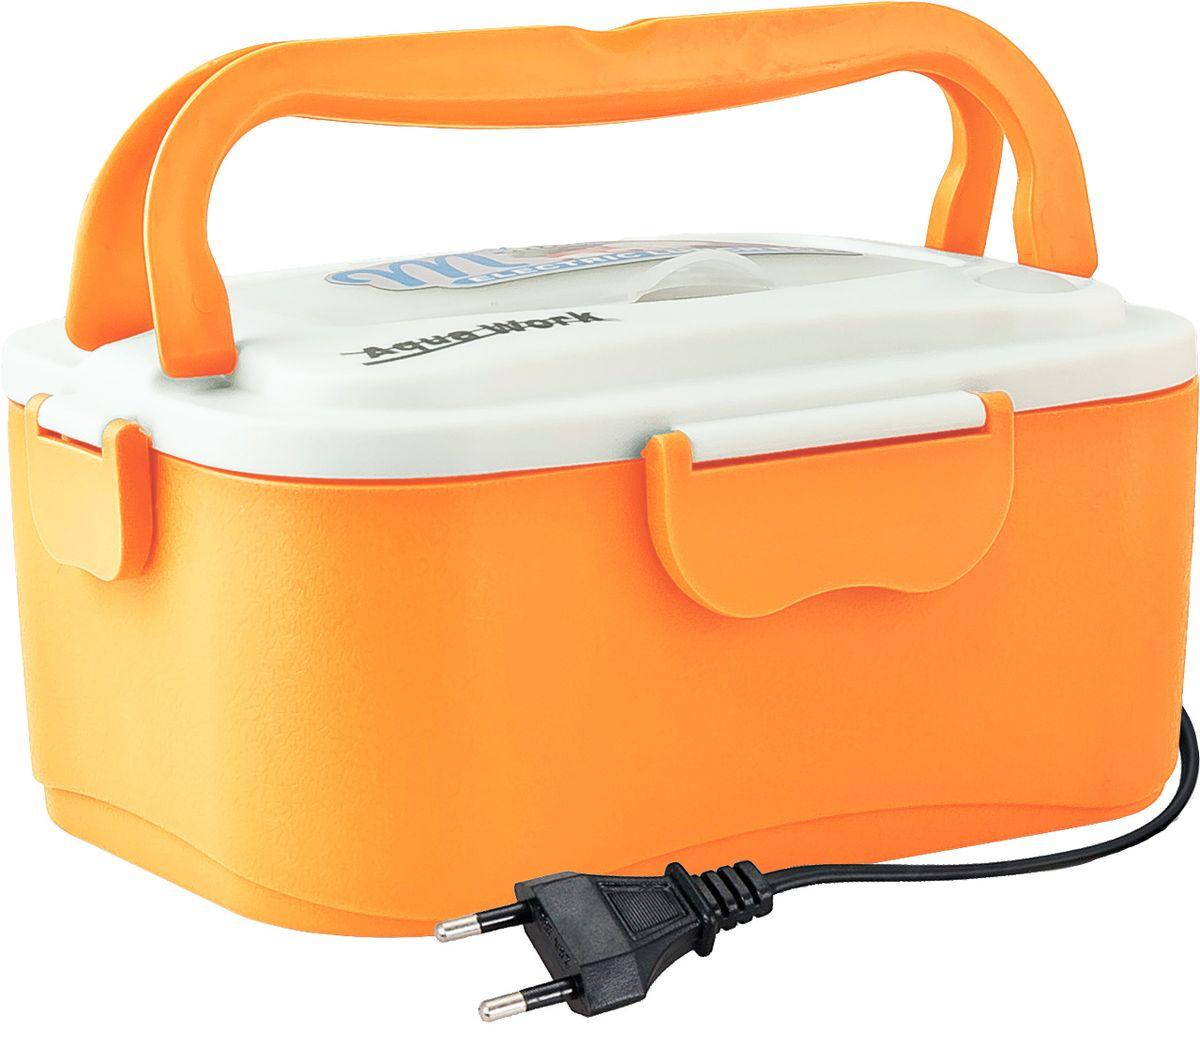 Aqua Work С5, Orange ланчбокс с подогревом 220В - Подогреватели посуды